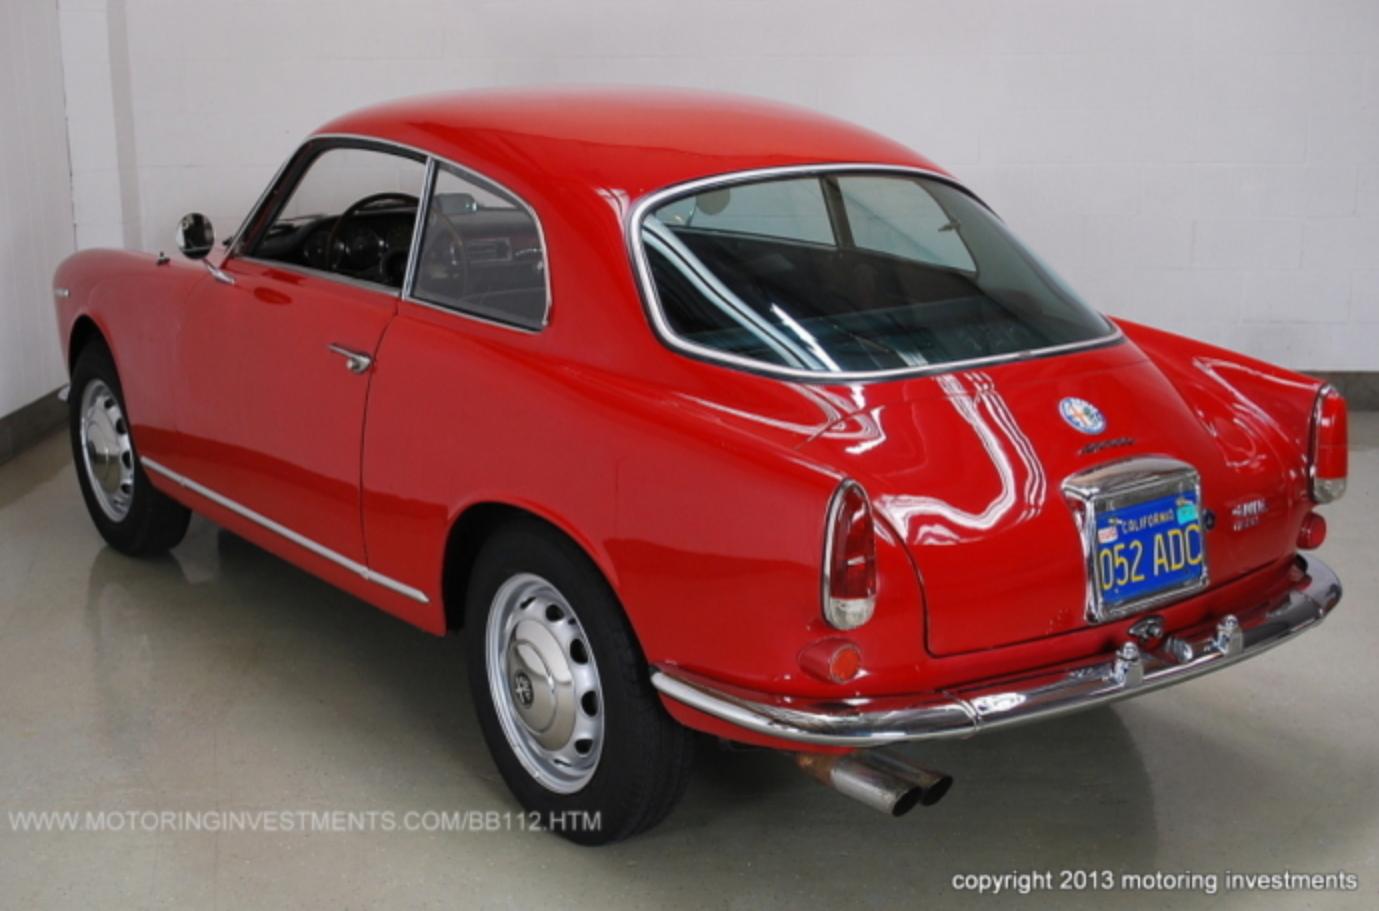 1962 alfa romeo giulietta 1600 sprint classic italian cars for sale. Black Bedroom Furniture Sets. Home Design Ideas